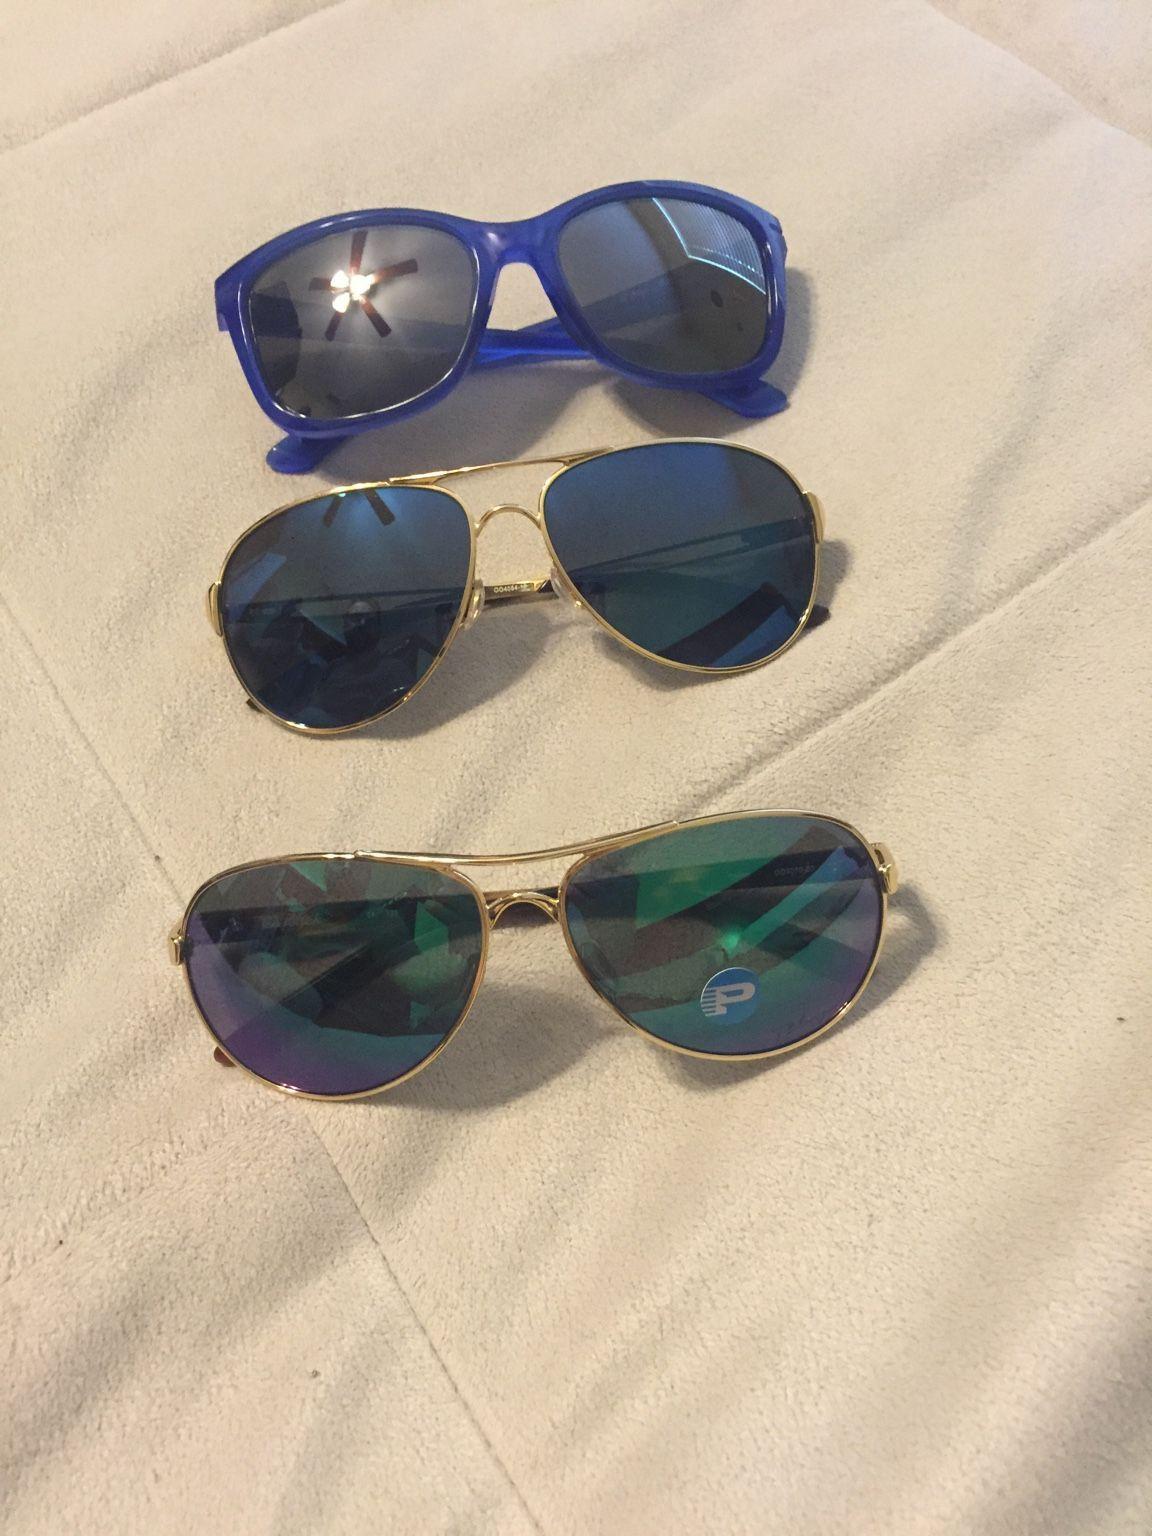 Many frames!!! EVEN LOWER!!!! Price drop!!!! - 36861a84ed2c913729c1a5814cdced33.jpg